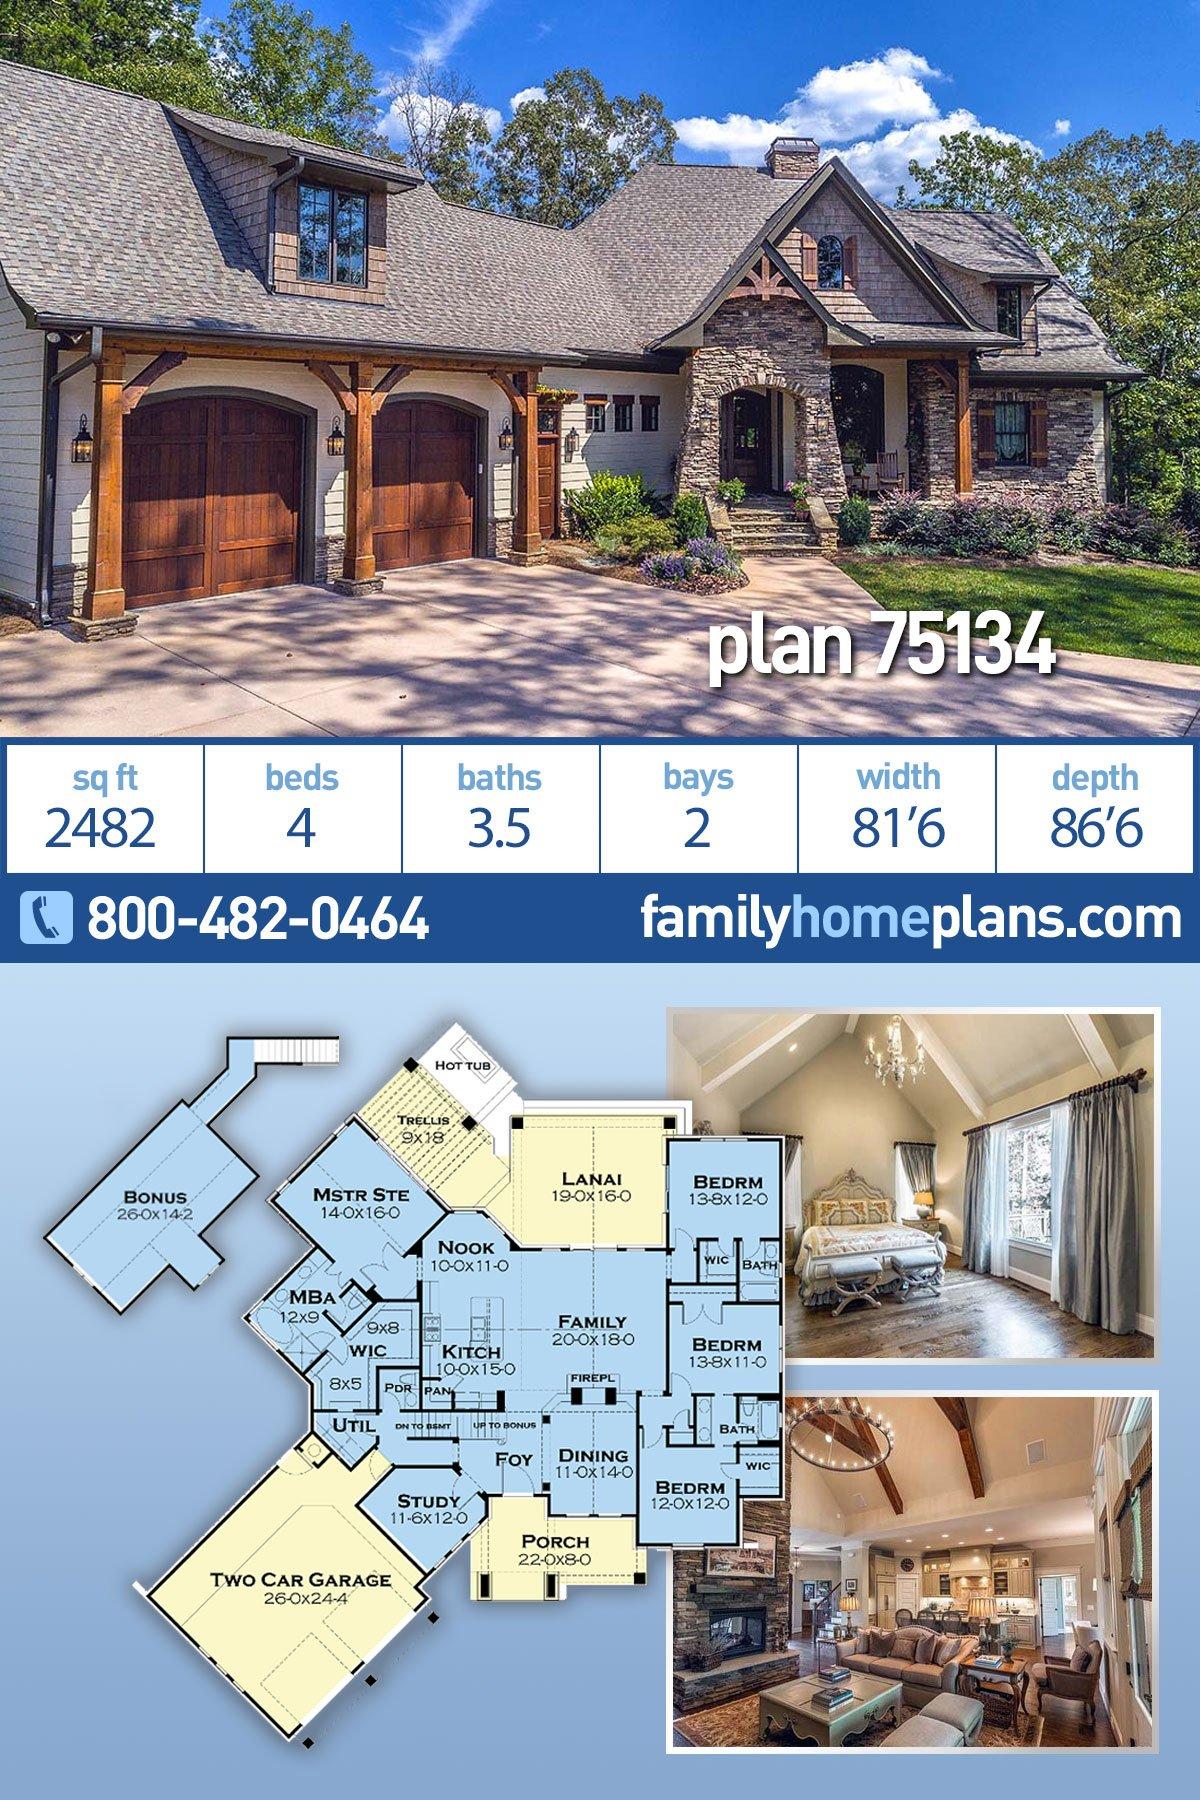 Cottage, Craftsman, Tuscan House Plan 75134 with 4 Beds, 4 Baths, 2 Car Garage